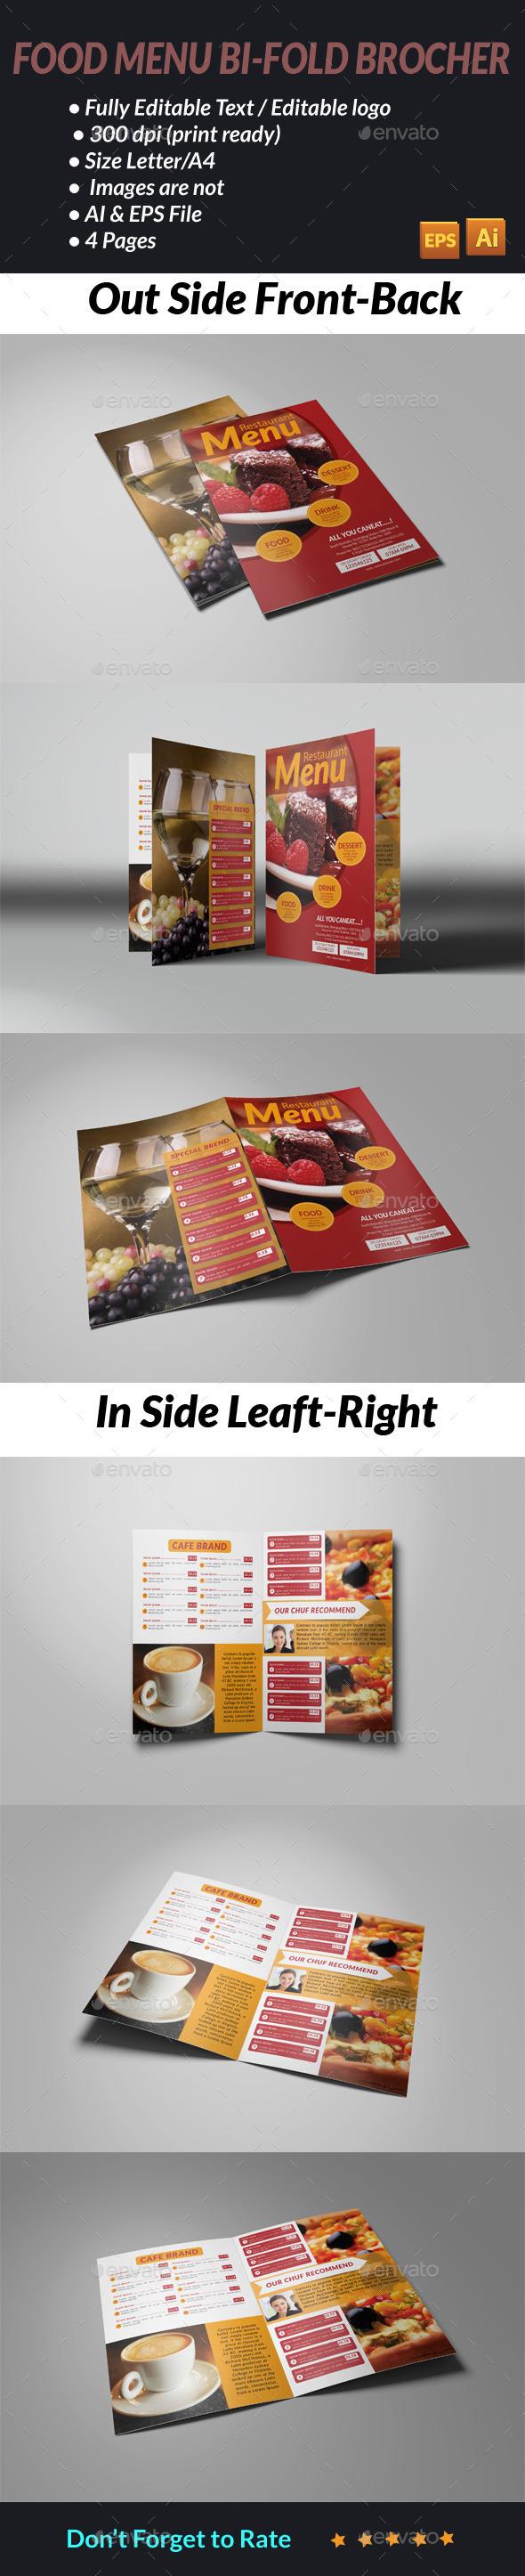 Food Menu Bi fold Brochure - Food Menus Print Templates